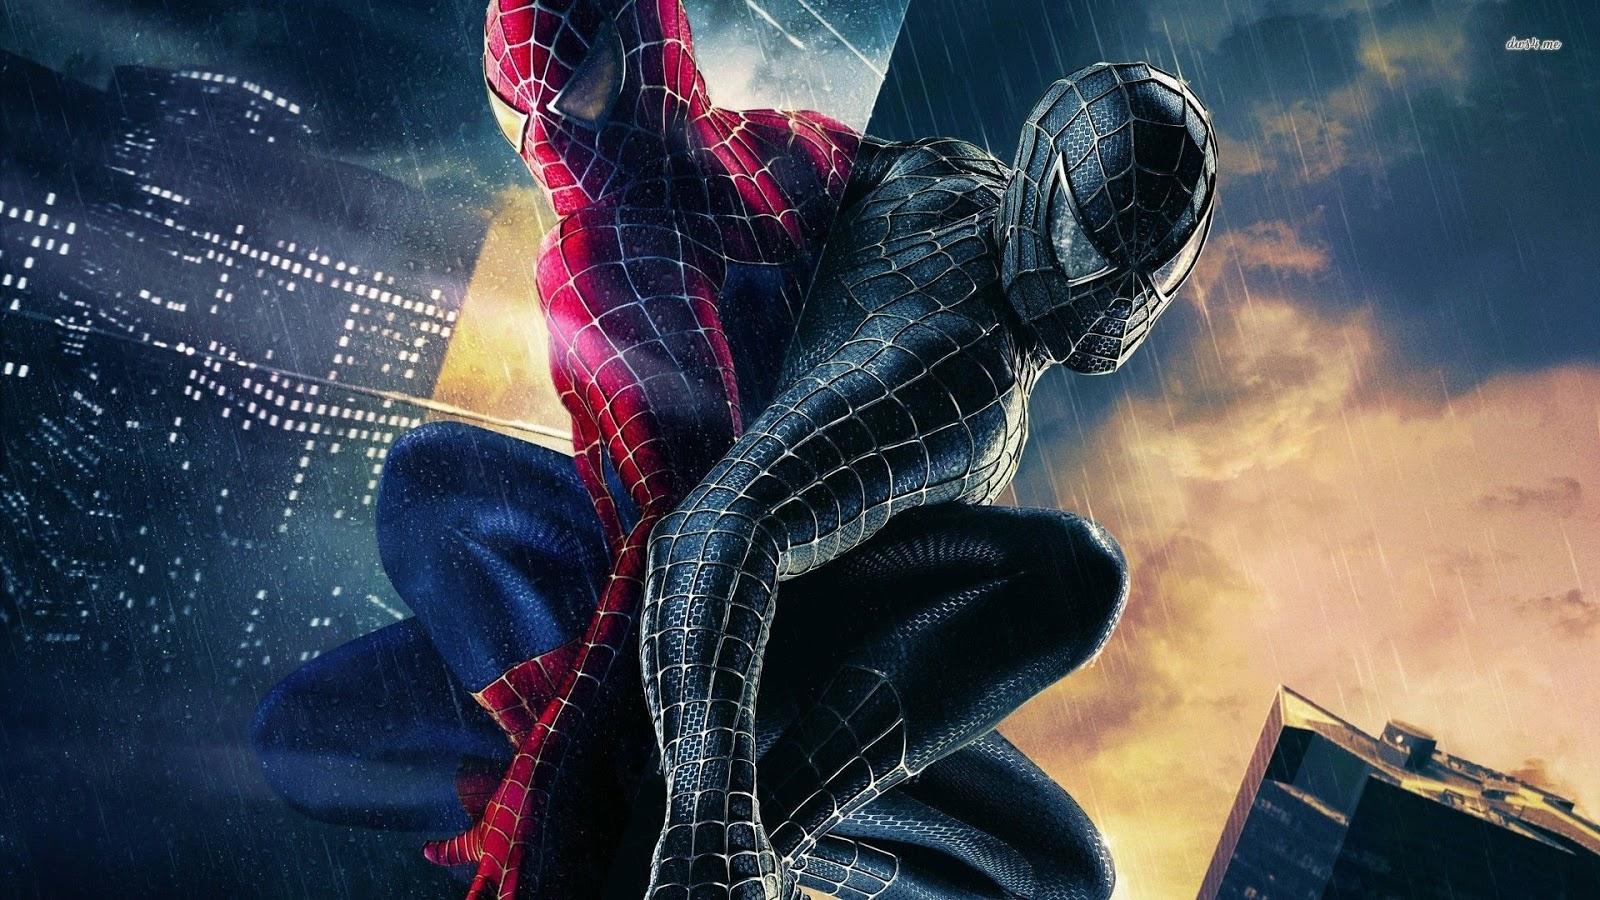 alex's essential movie blog: is spider-man 3 actually good?